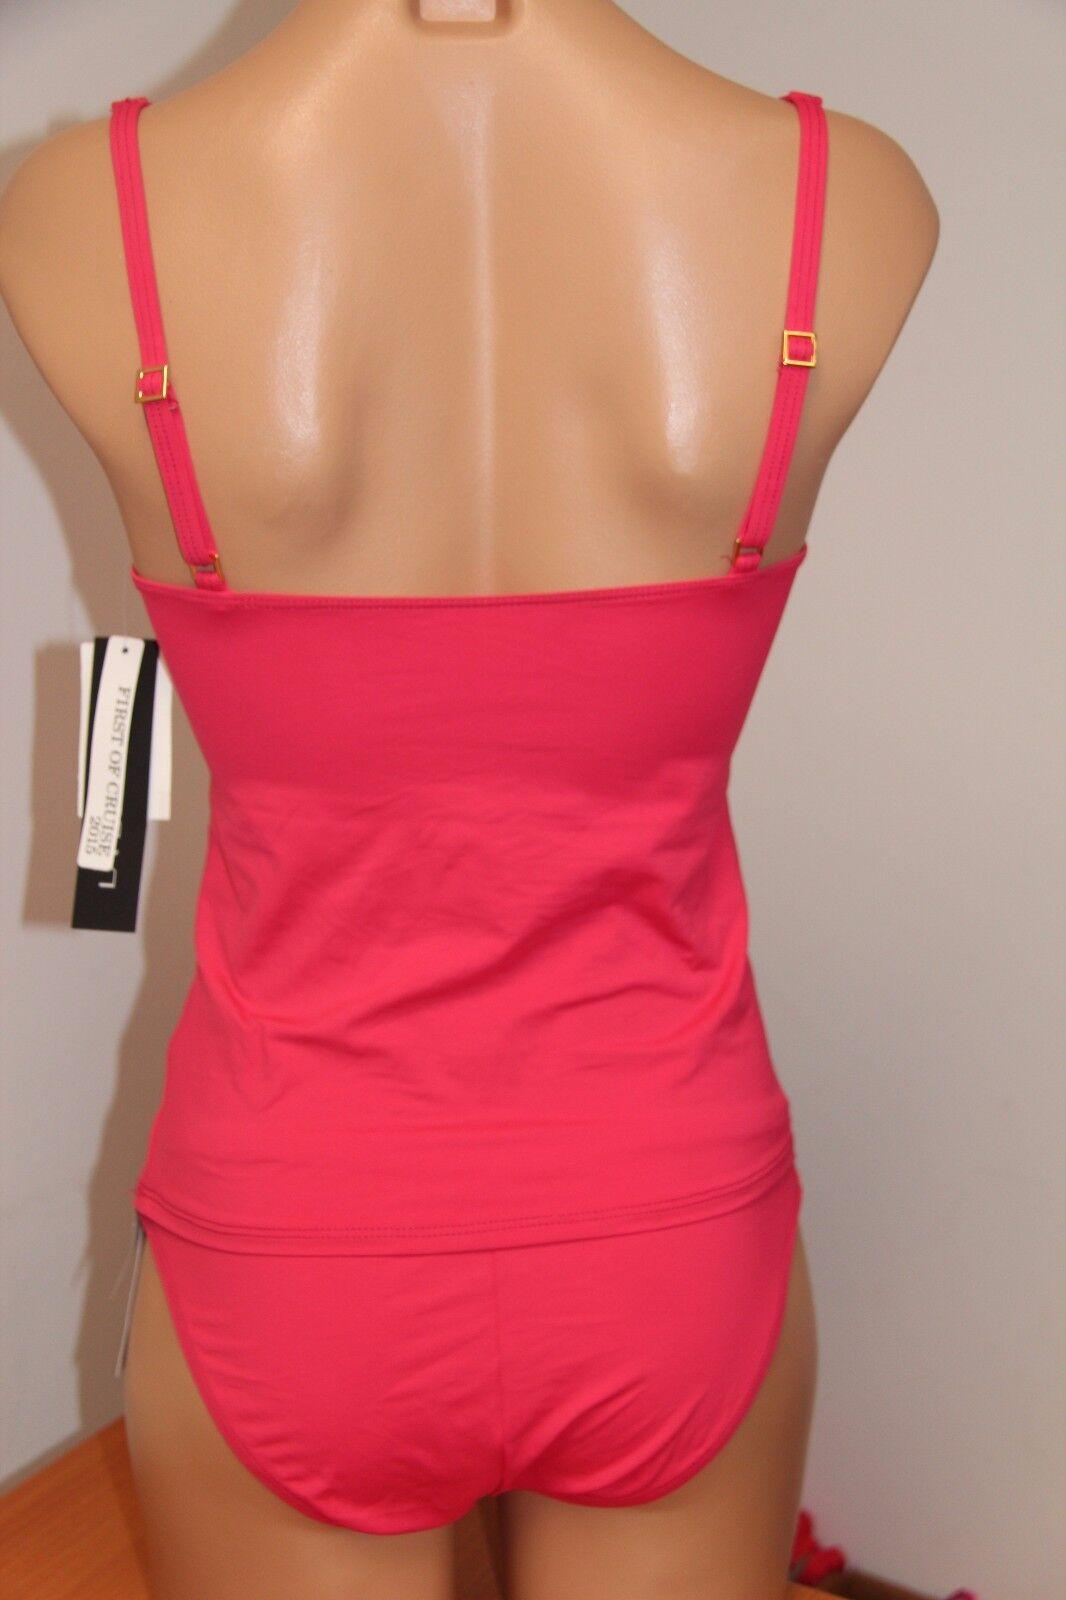 New La La La whitea Swimsuit Bikini Tankini 2 pc set Sz 14 PINK c9d6a7